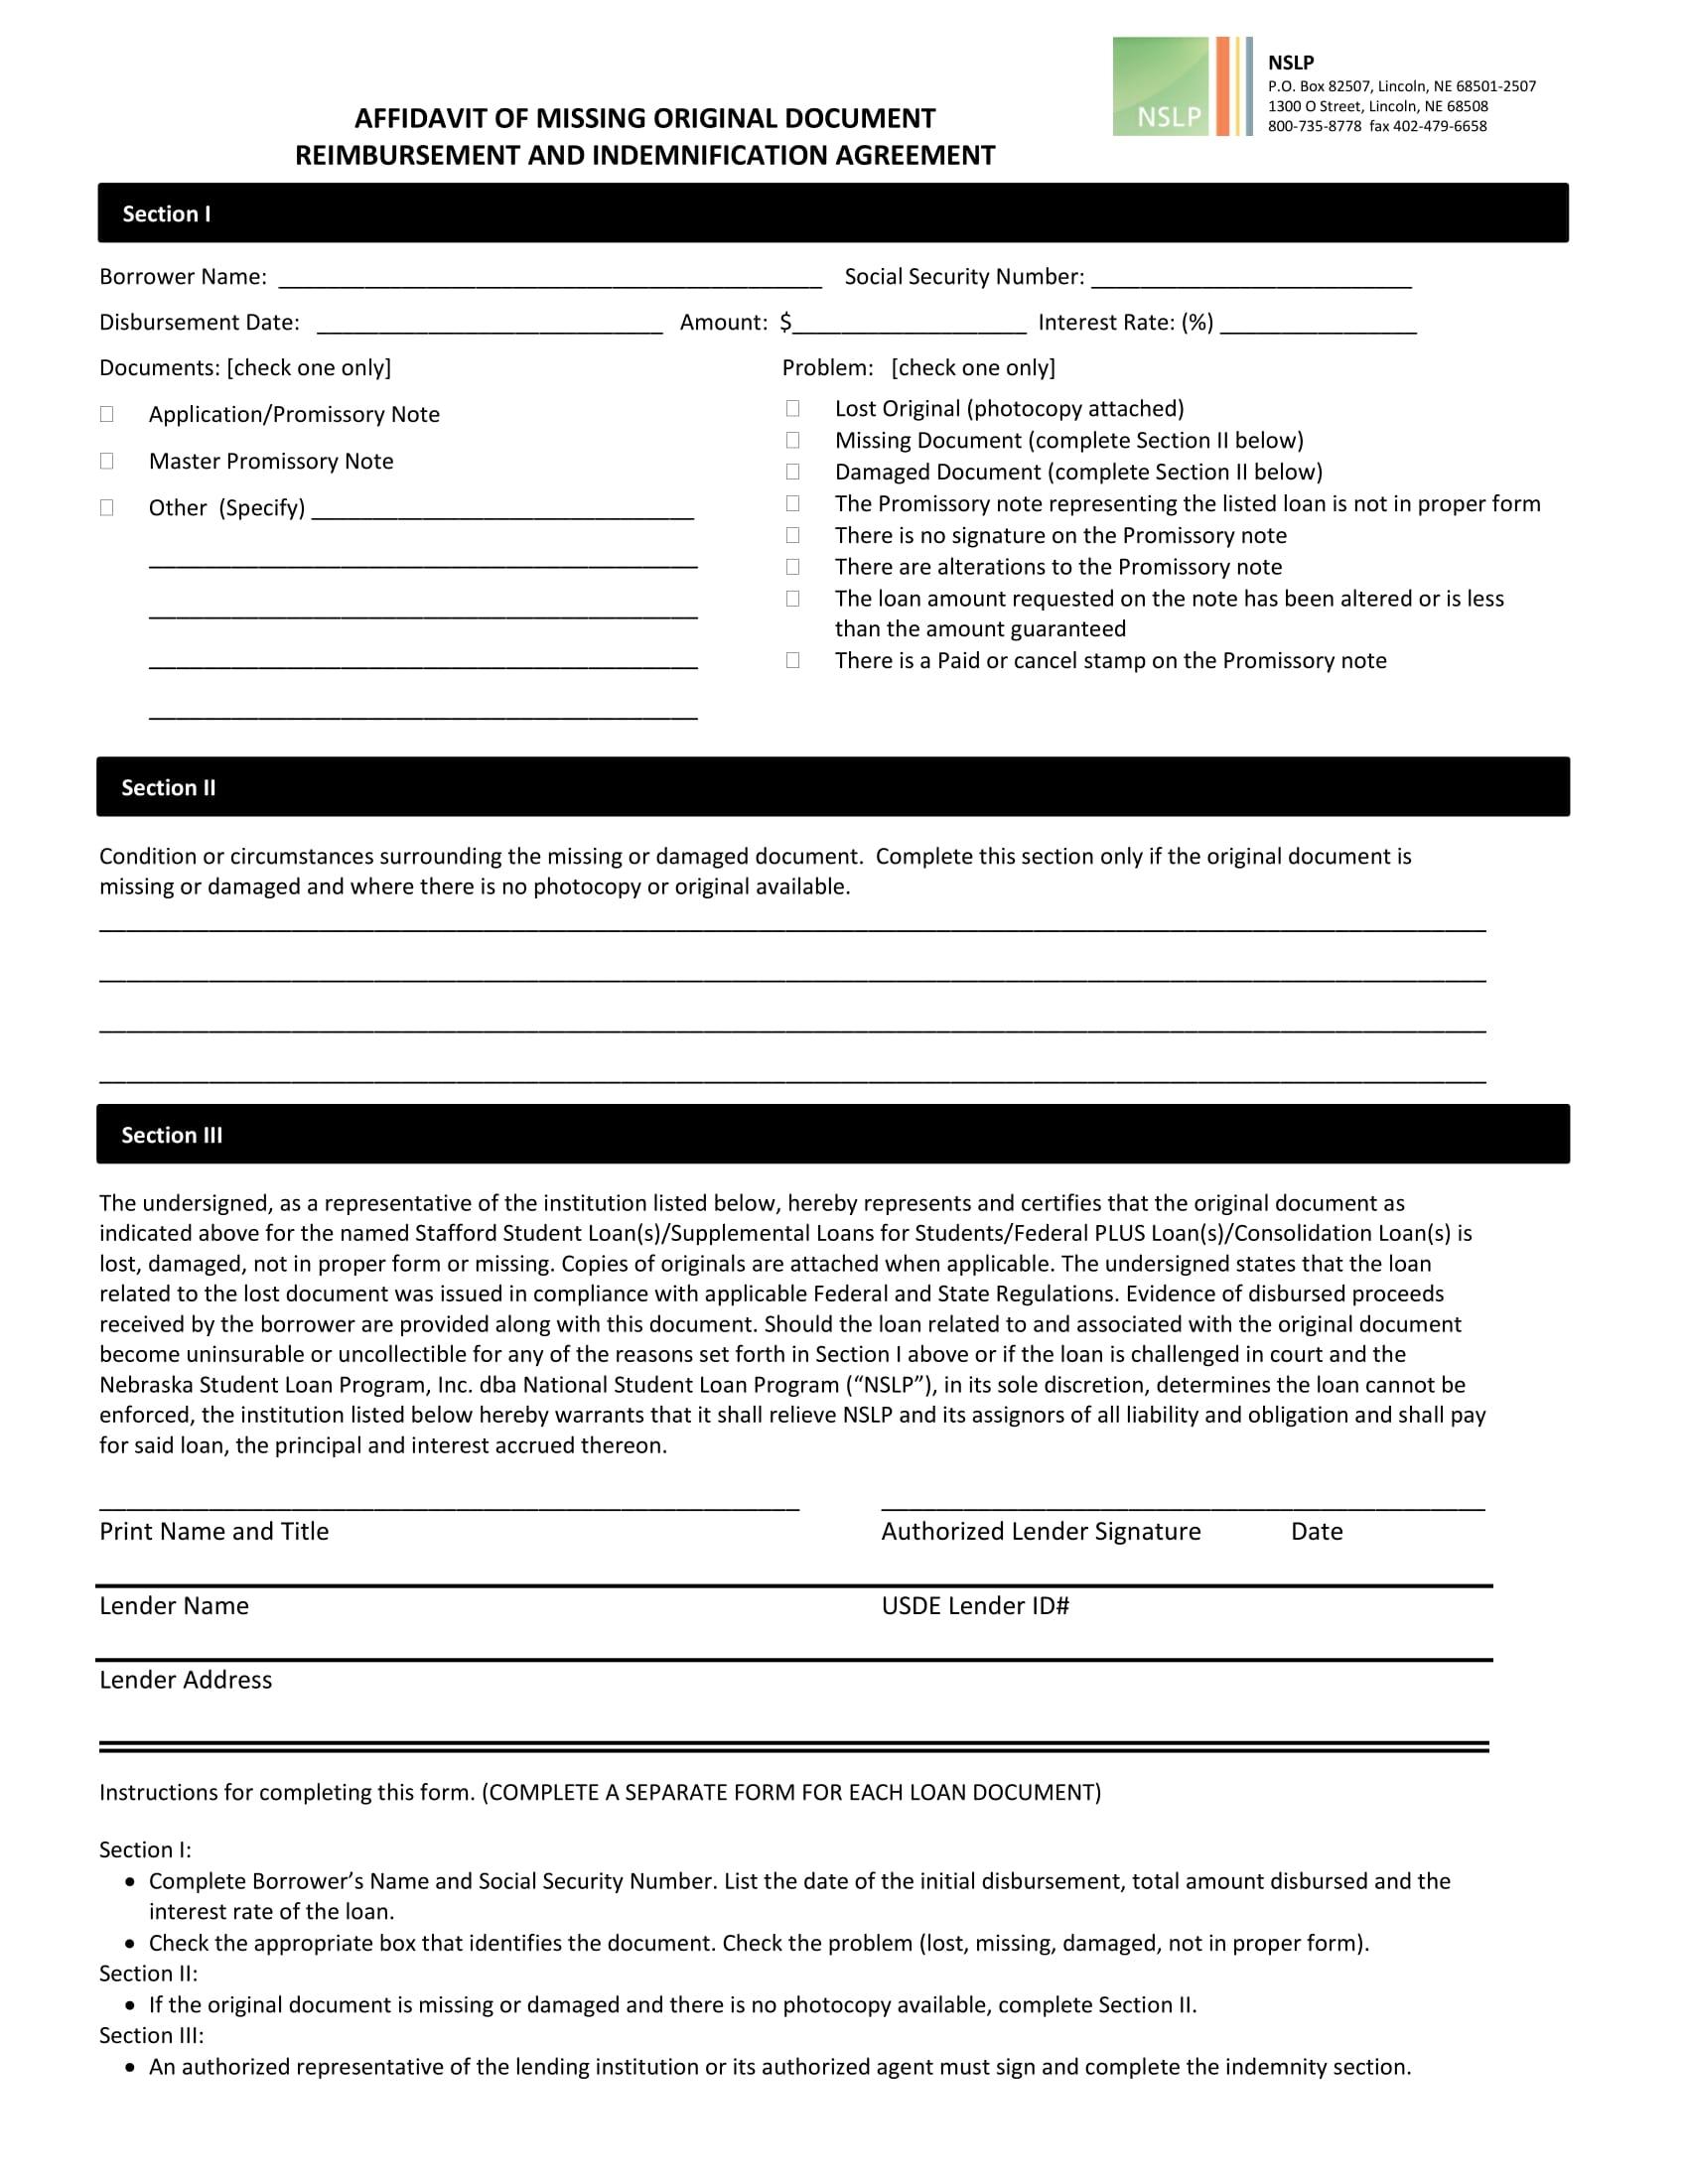 affidavit of missing document form sample 1